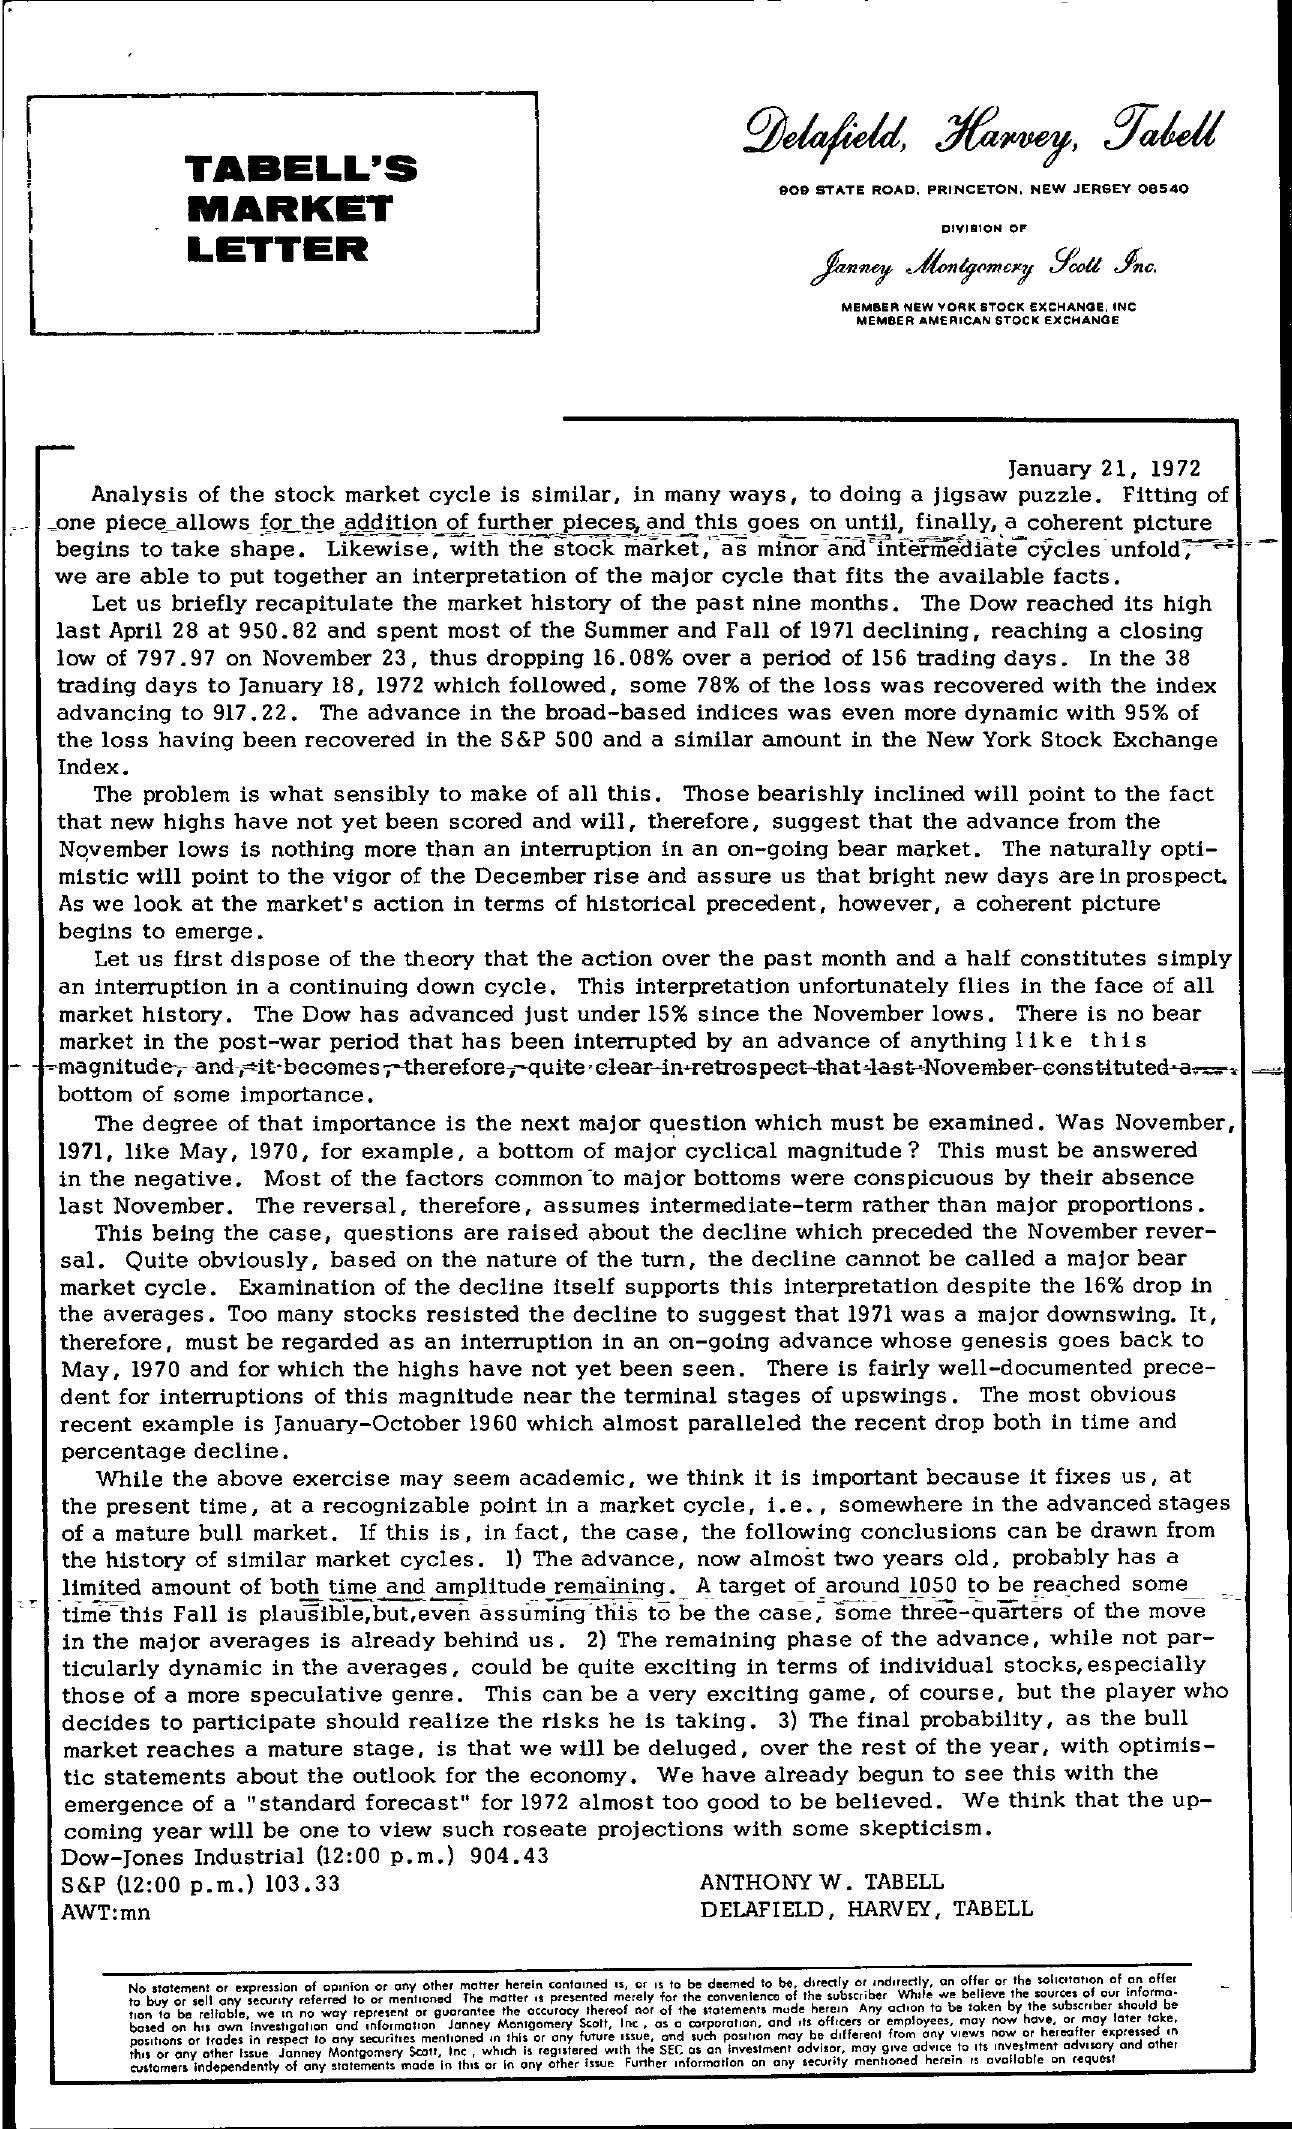 Tabell's Market Letter - January 21, 1972